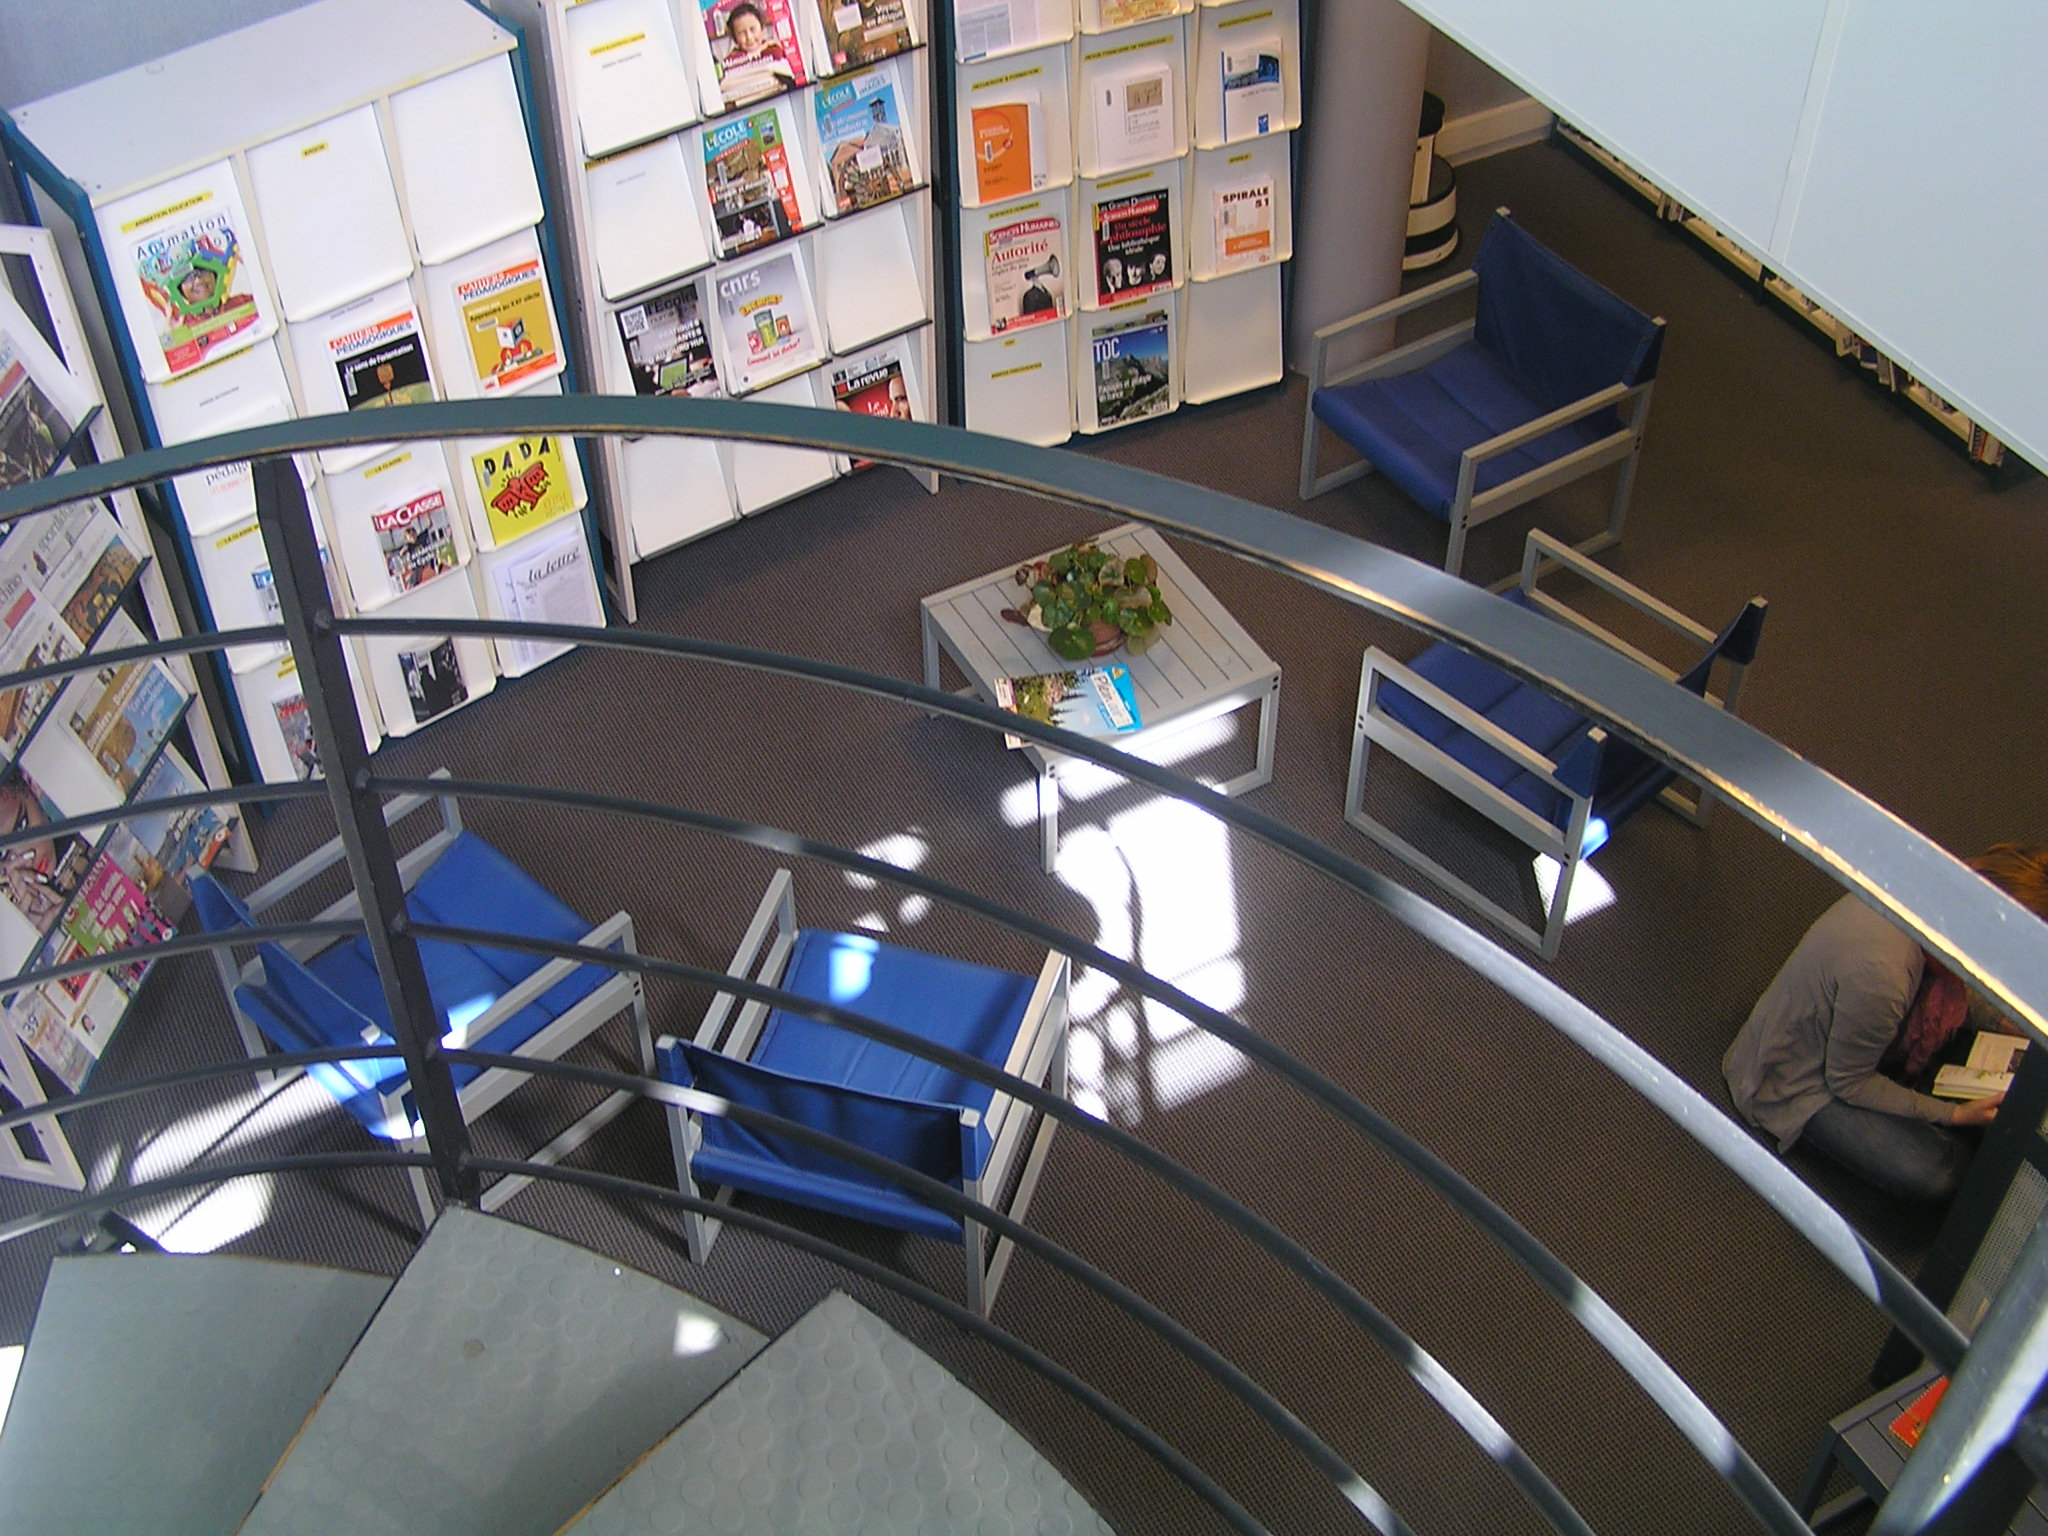 file biblioth que de formation des ma tres iufm brest france espace revues p dagogiques. Black Bedroom Furniture Sets. Home Design Ideas